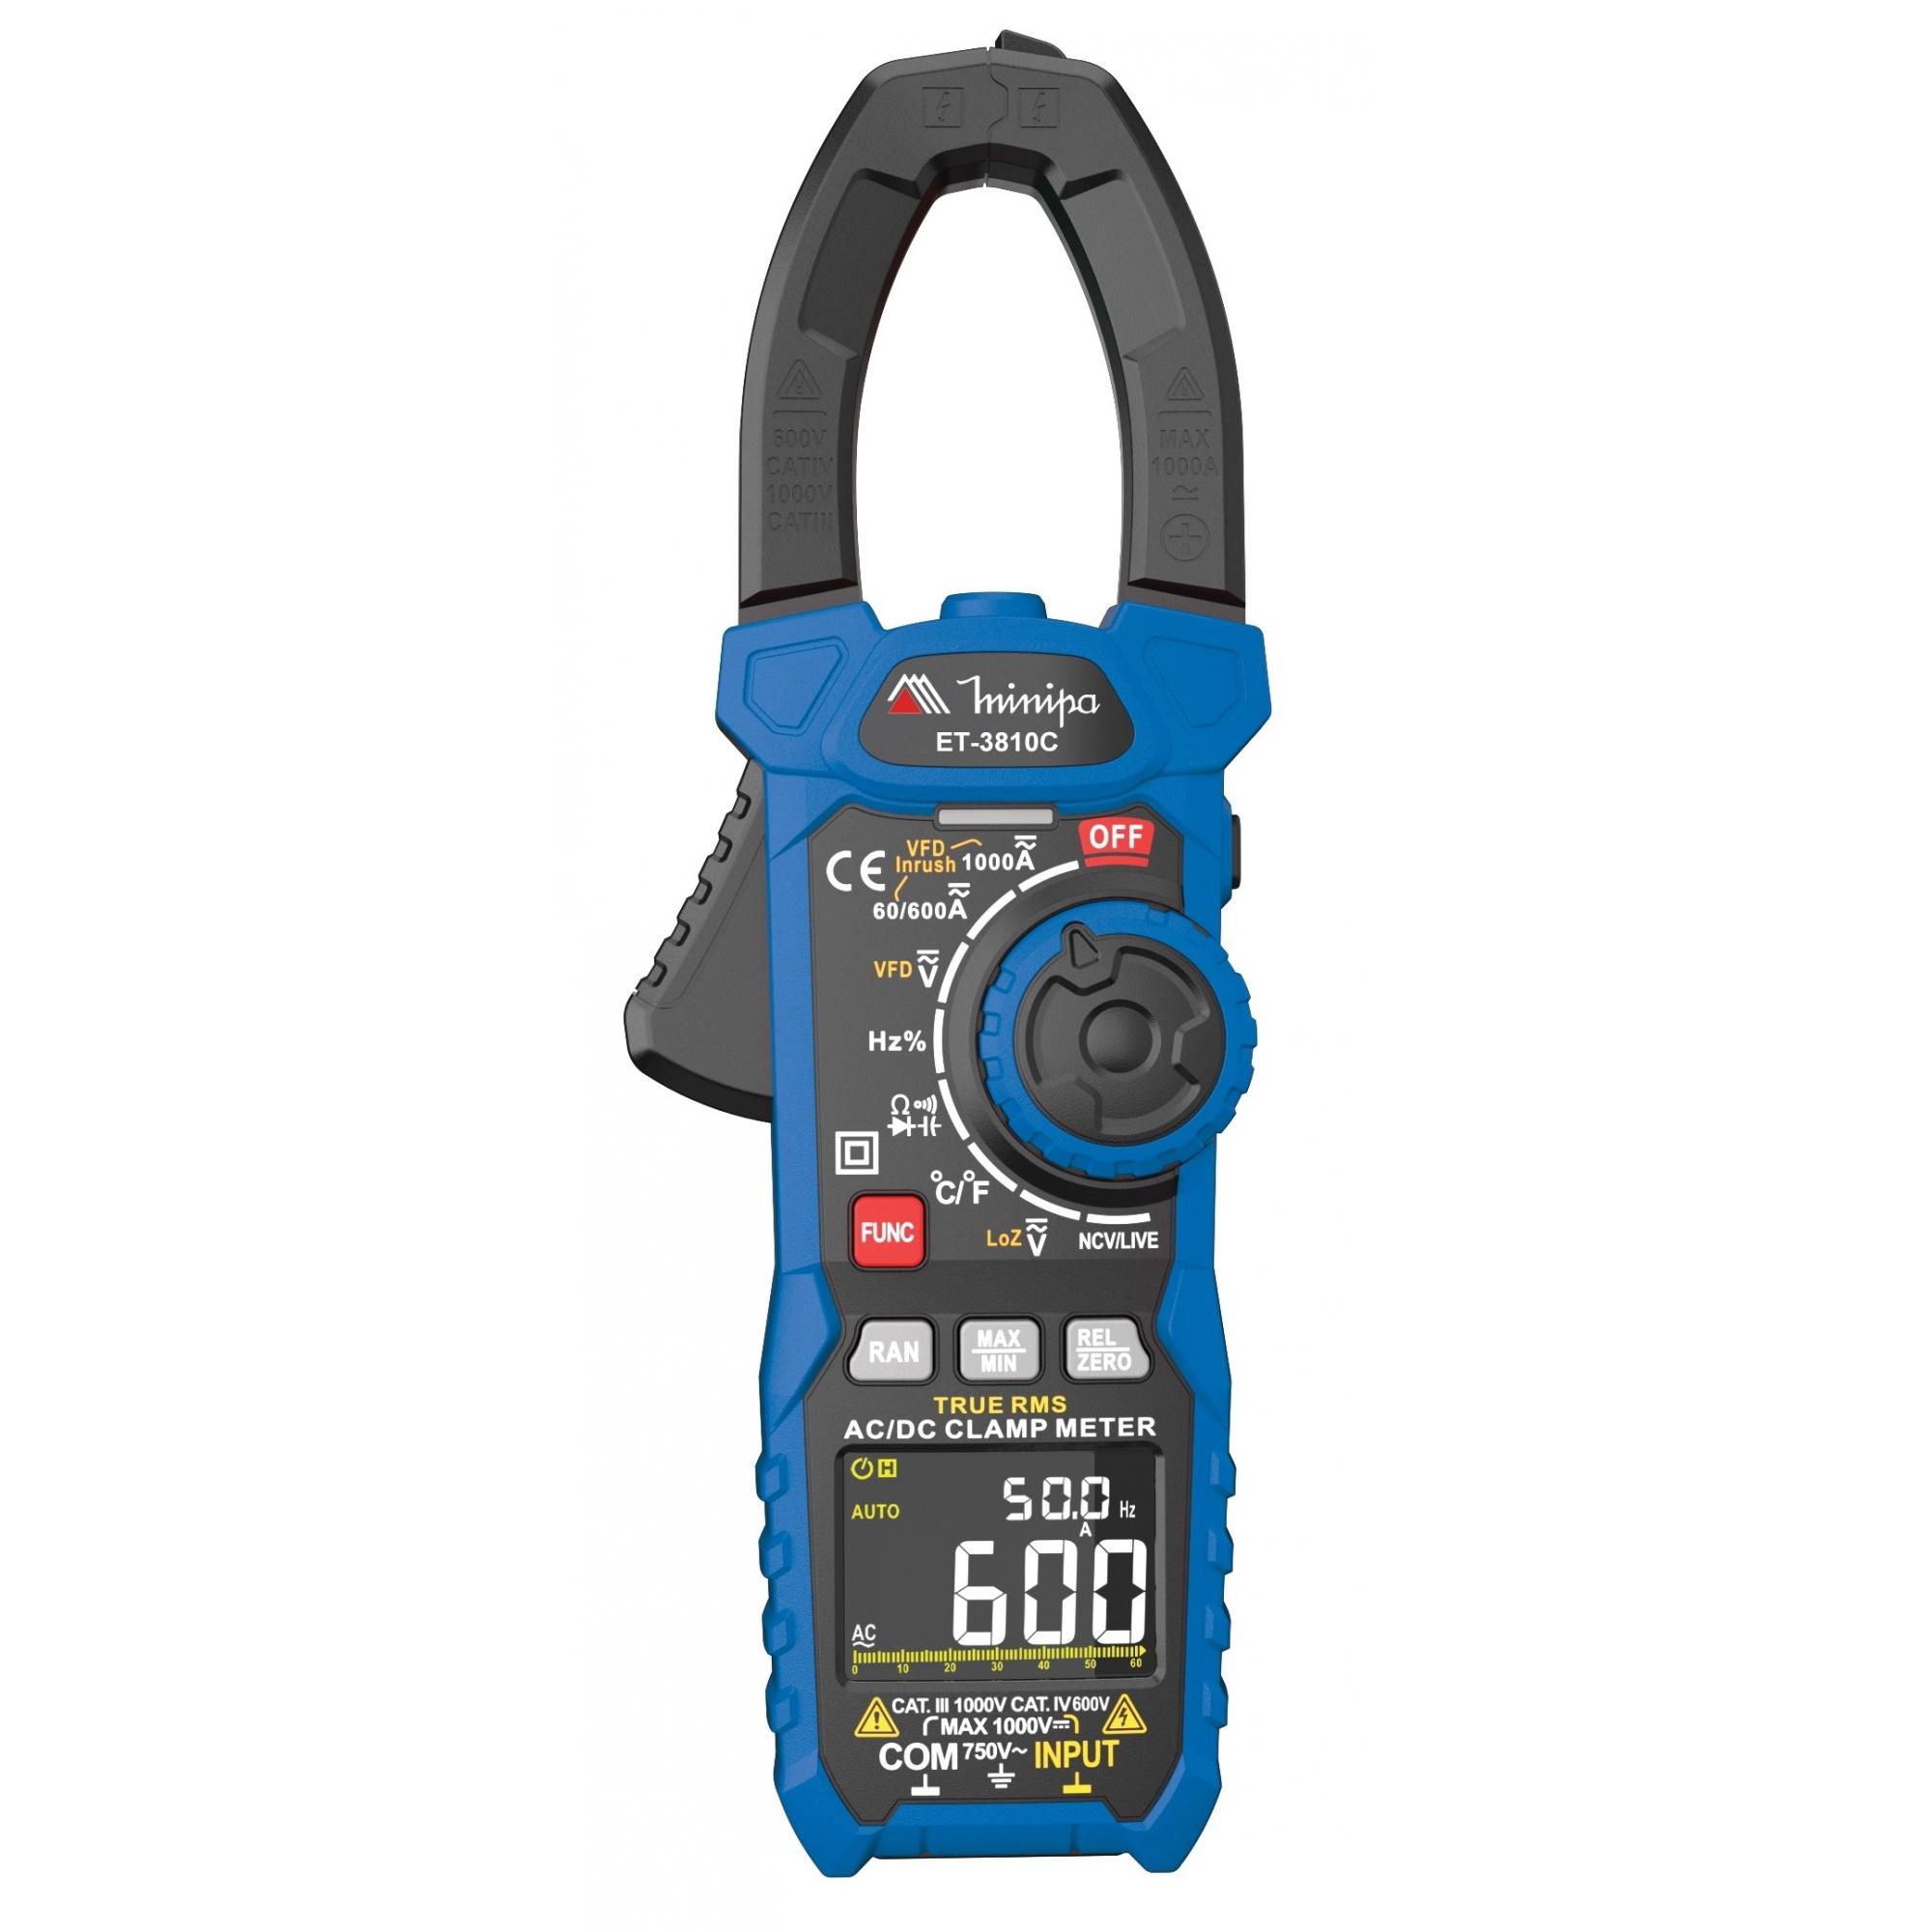 Alicate Amperímetro Minipa ET-3810C  - MRE Ferramentas